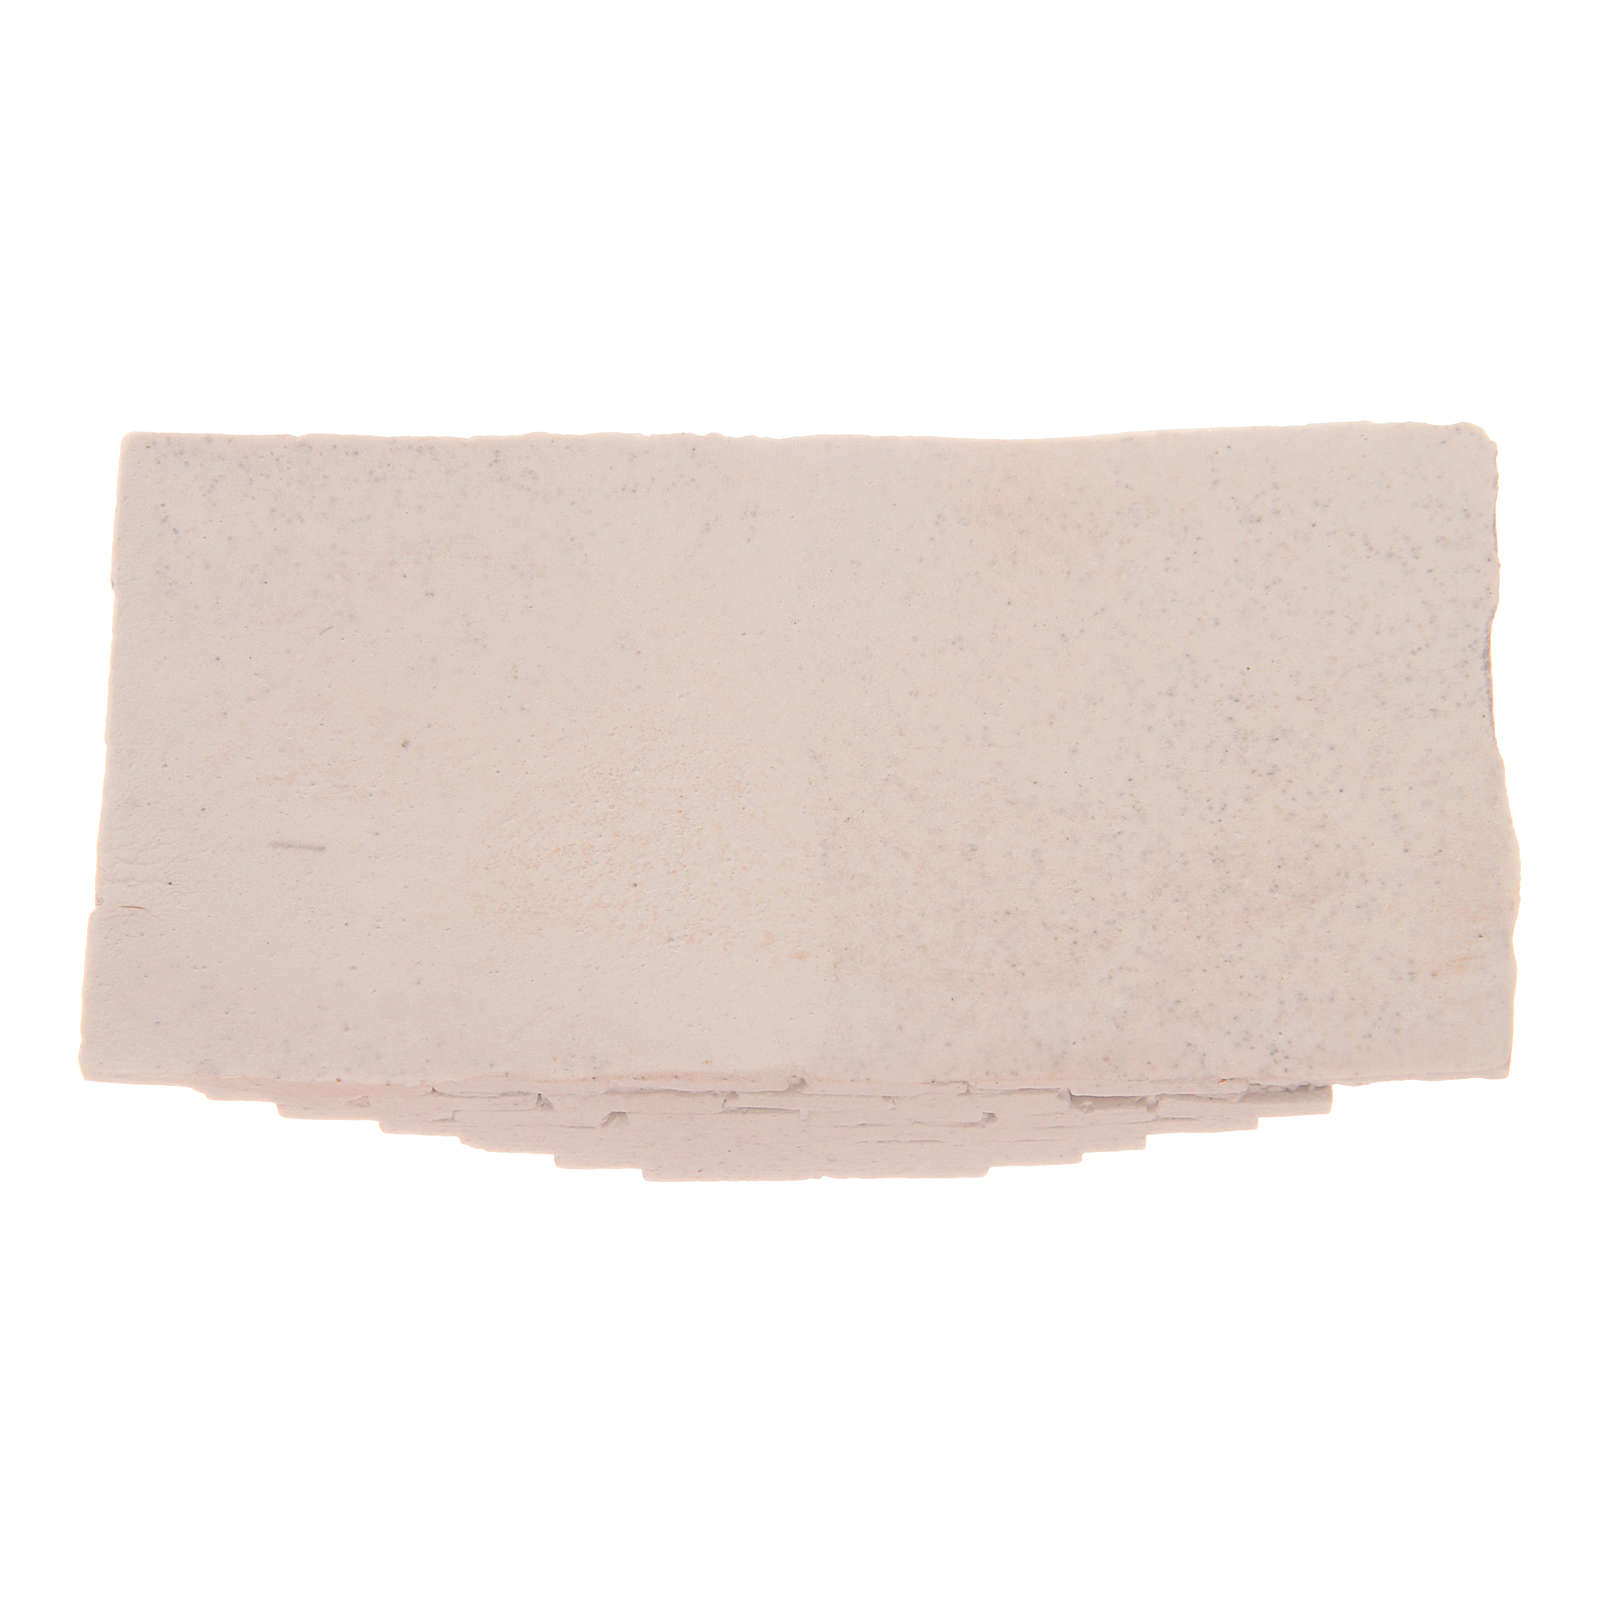 Scalinata su 3 lati in resina 4